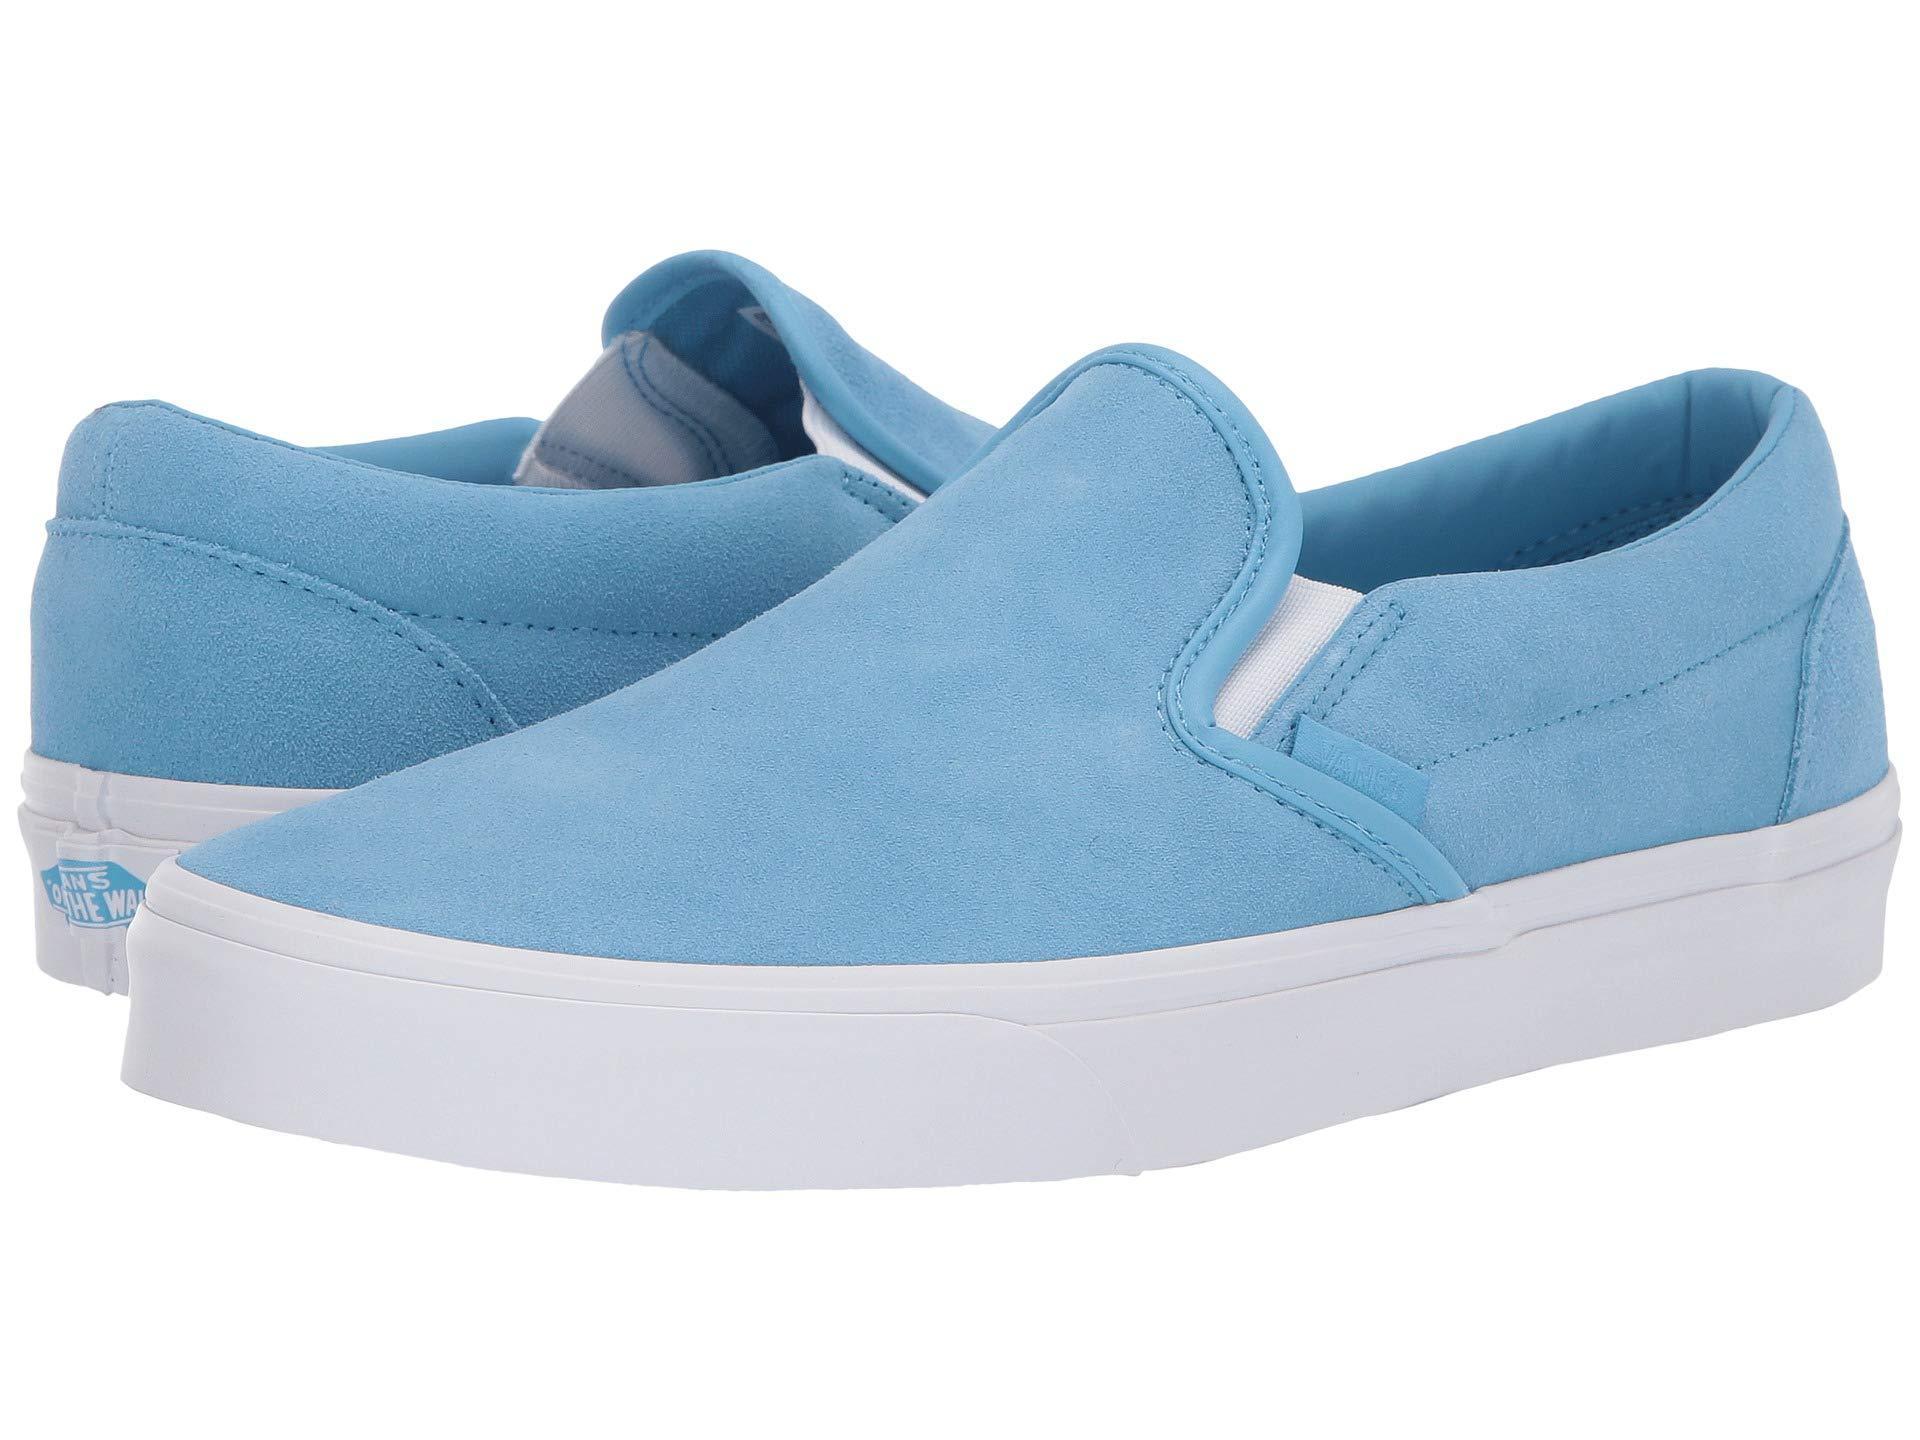 Vans. Men s Blue Classic Slip-ontm ((embossed Suede) Sequoia true White)  Skate Shoes 9827133780e